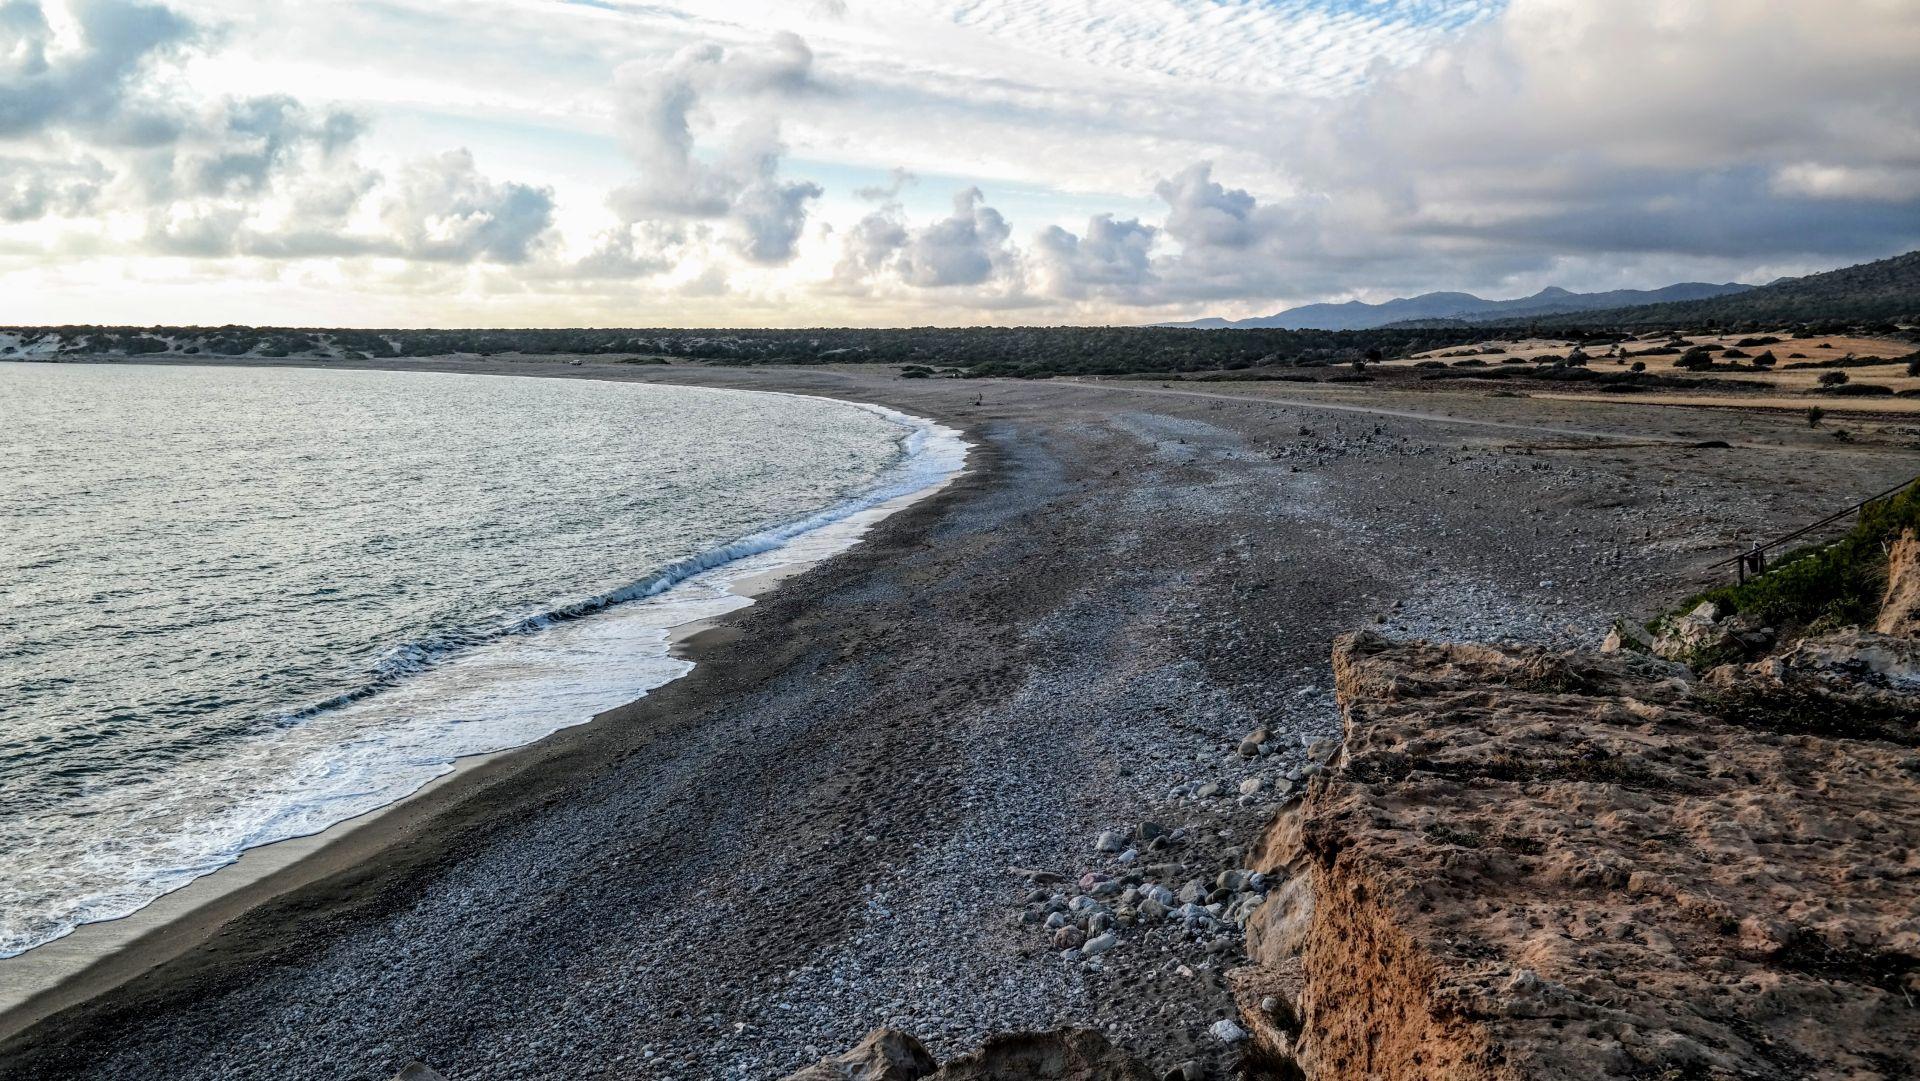 Cypr - Zatoka Lara Beach